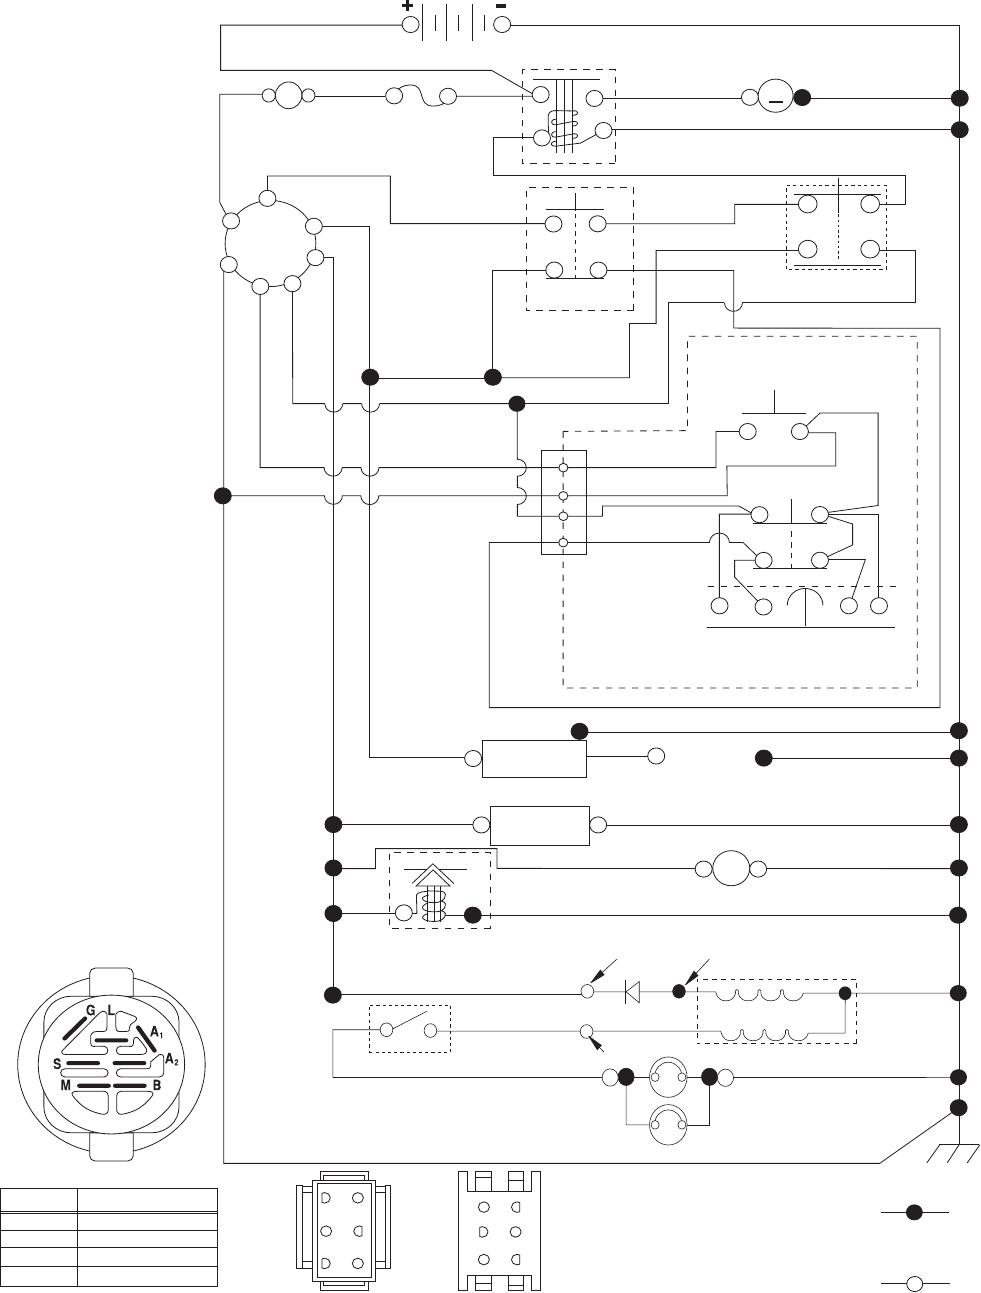 Poulan Repair Manual Pb195h42lt 2004 Mpt 800 Ezgo Gas Workhorse Wiring Diagram Sophisticated Riding Mower Parts Photos Array Ipl Pro 426140 96042003603 Us 96042003604 Rh Usermanual Wiki